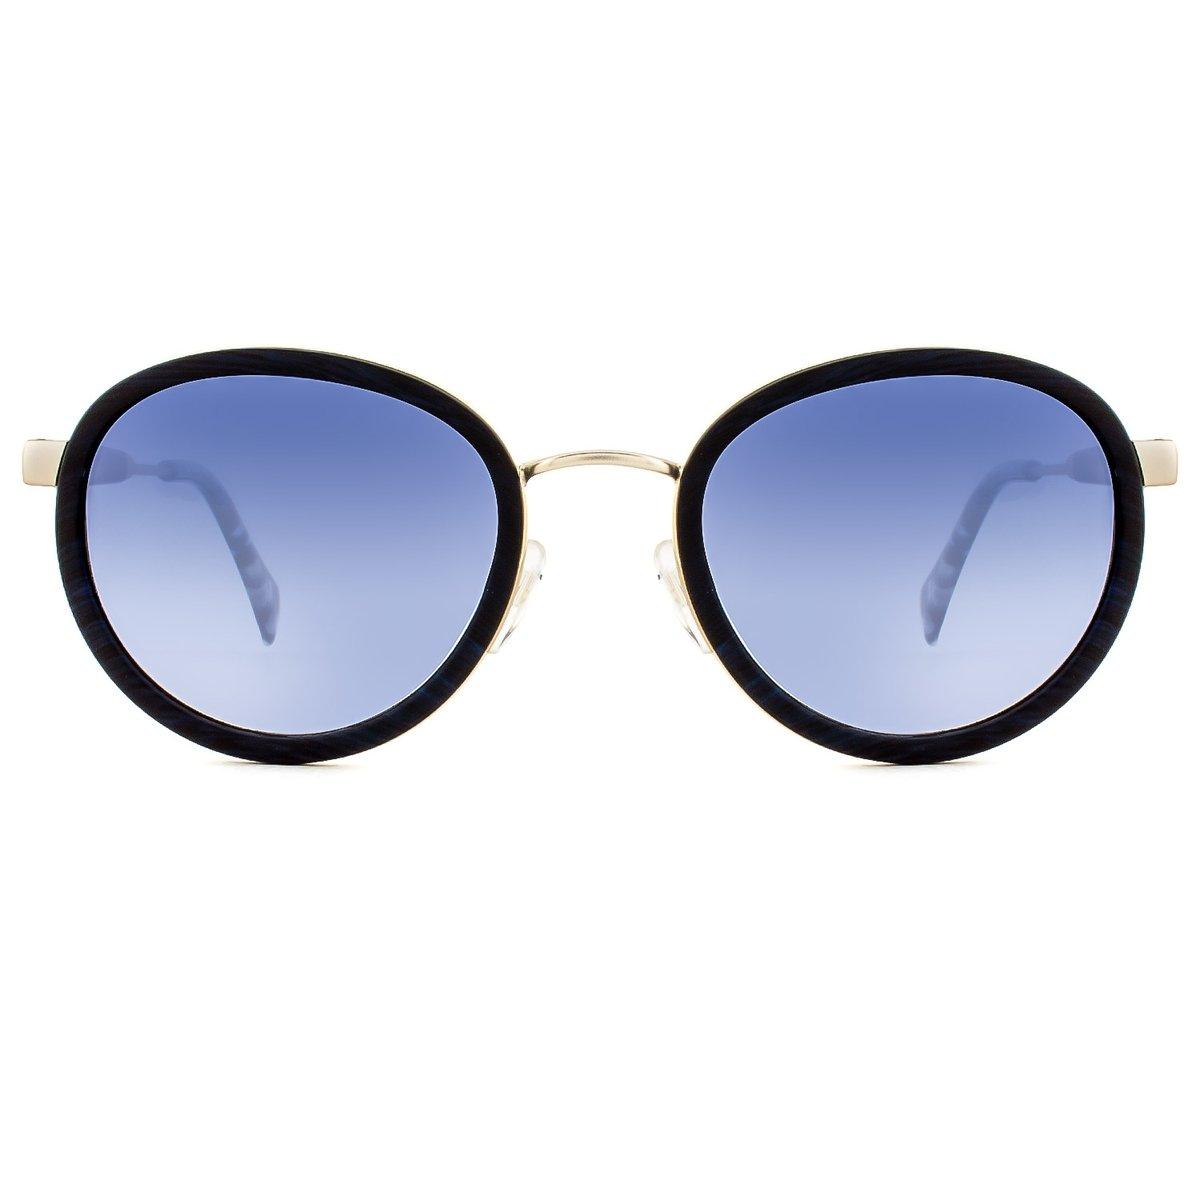 fc55cbeb3b2d3 Óculos Tommy Hilfiger TH1307 S T8DI 50 - Compre Agora   Netshoes